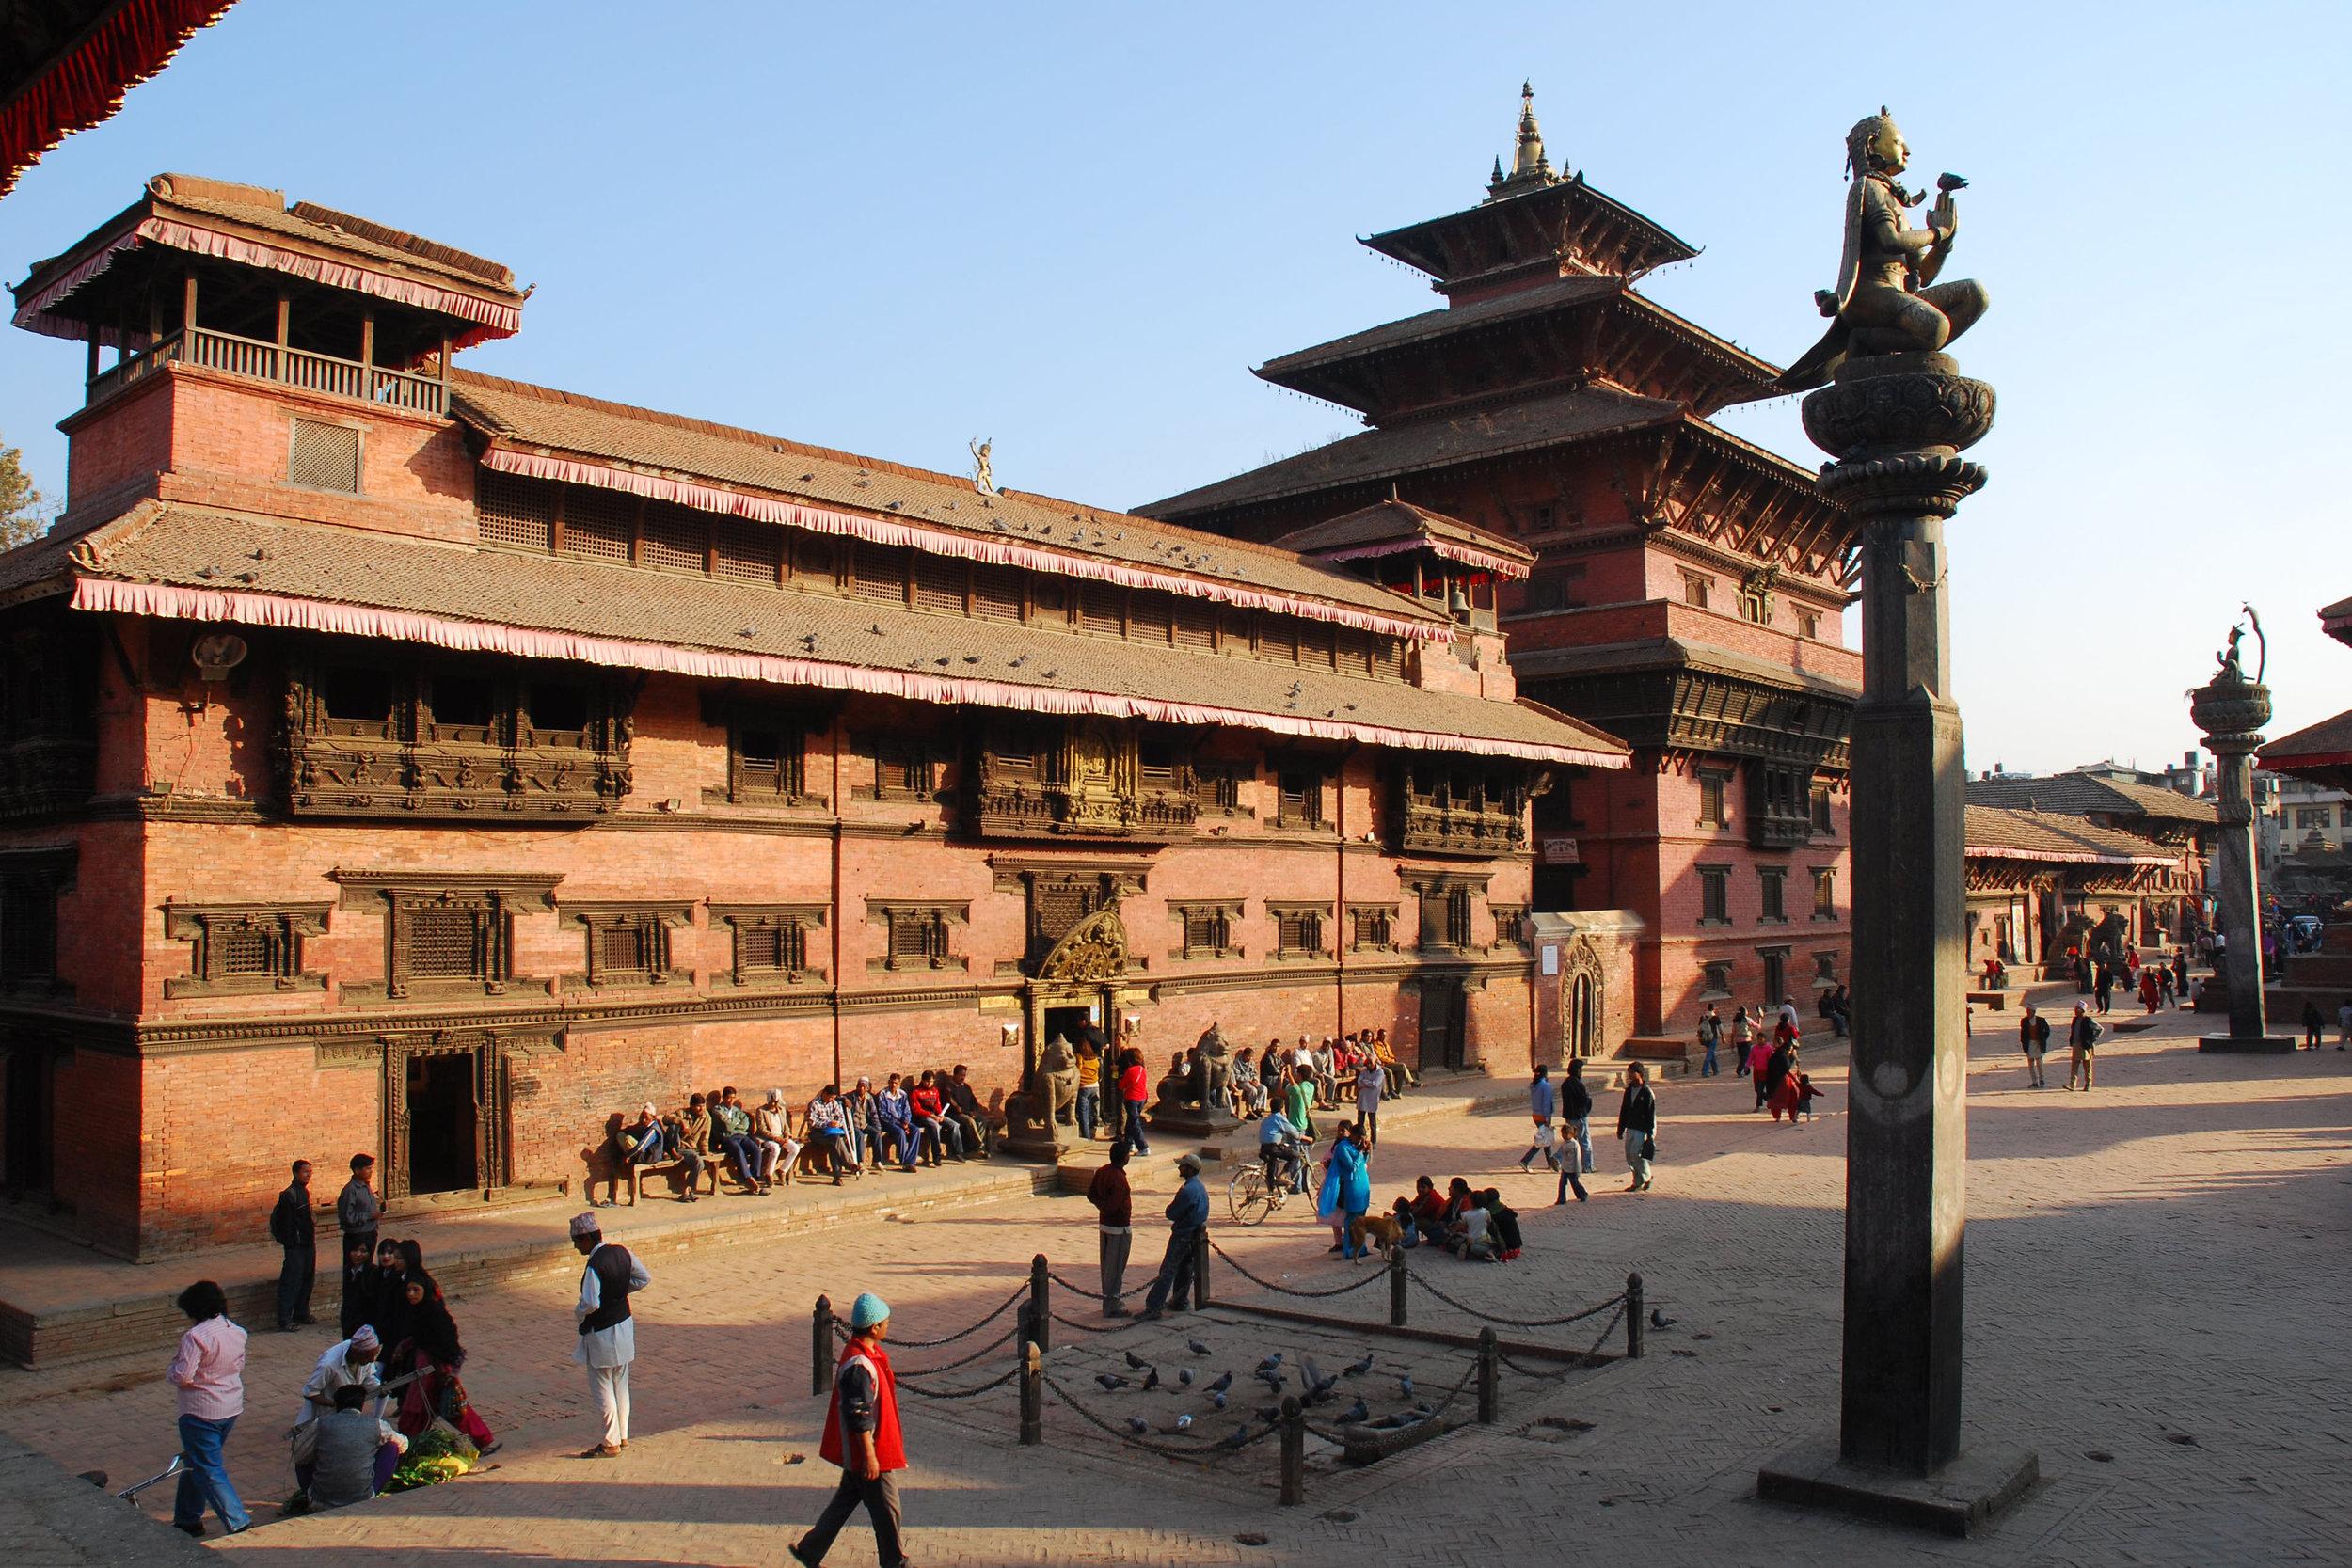 Patan Museum & Taleju temple, Patan Durbar Square-TNB12.jpg